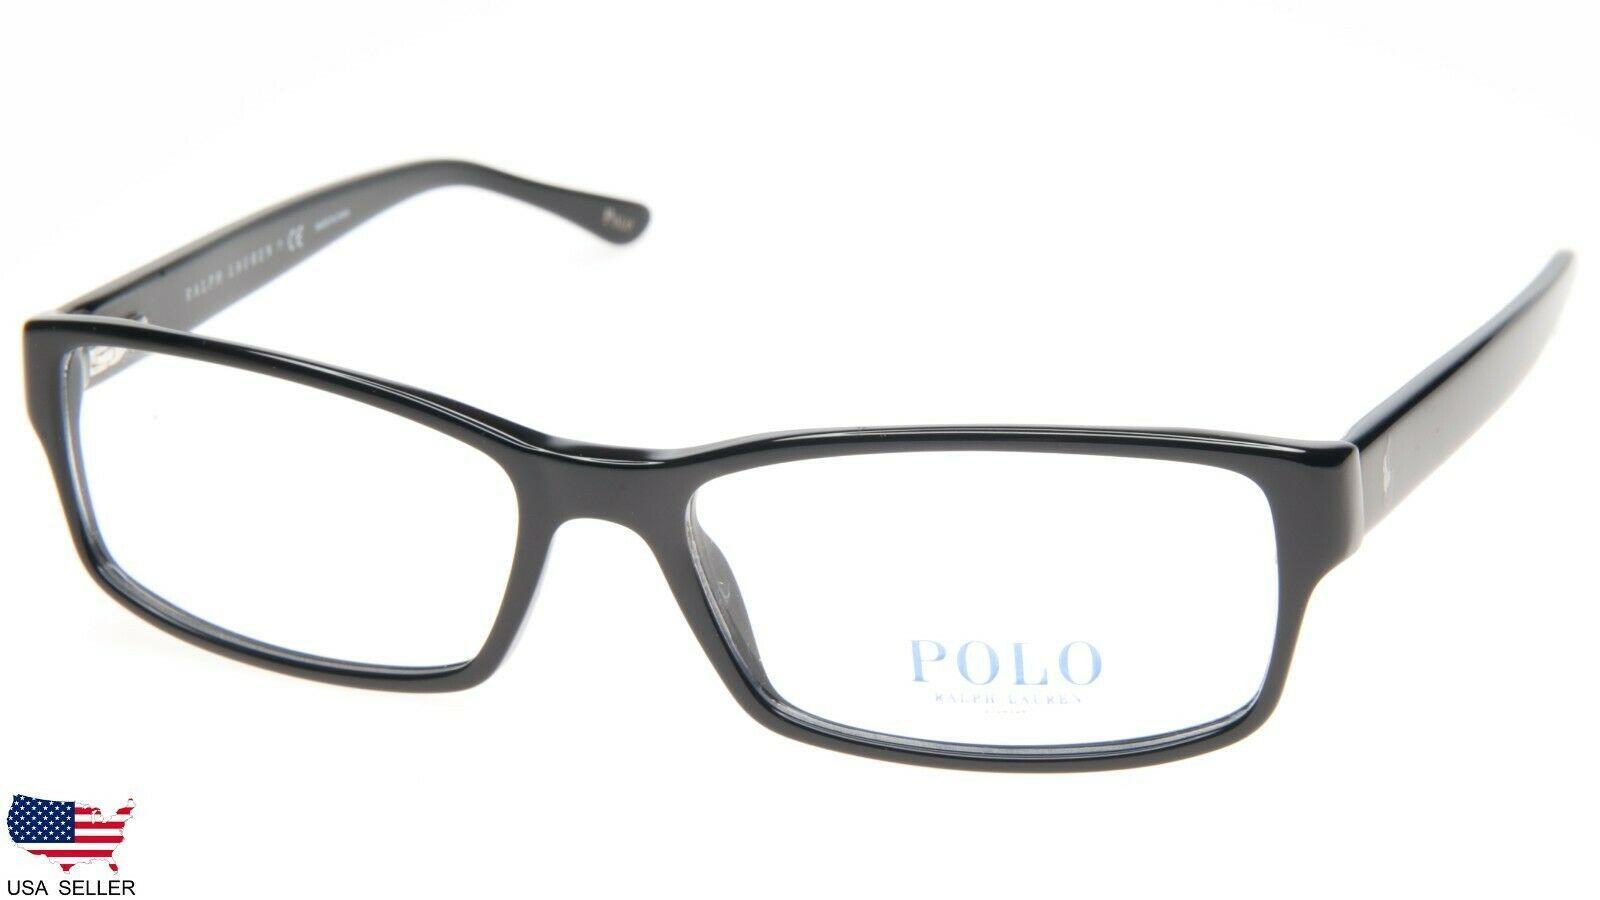 861782f0eb6f1 NEW POLO RALPH LAUREN PH 2065 5001 SHINY BLACK EYEGLASSES FRAME 56-16-140  B31mm -  98.98